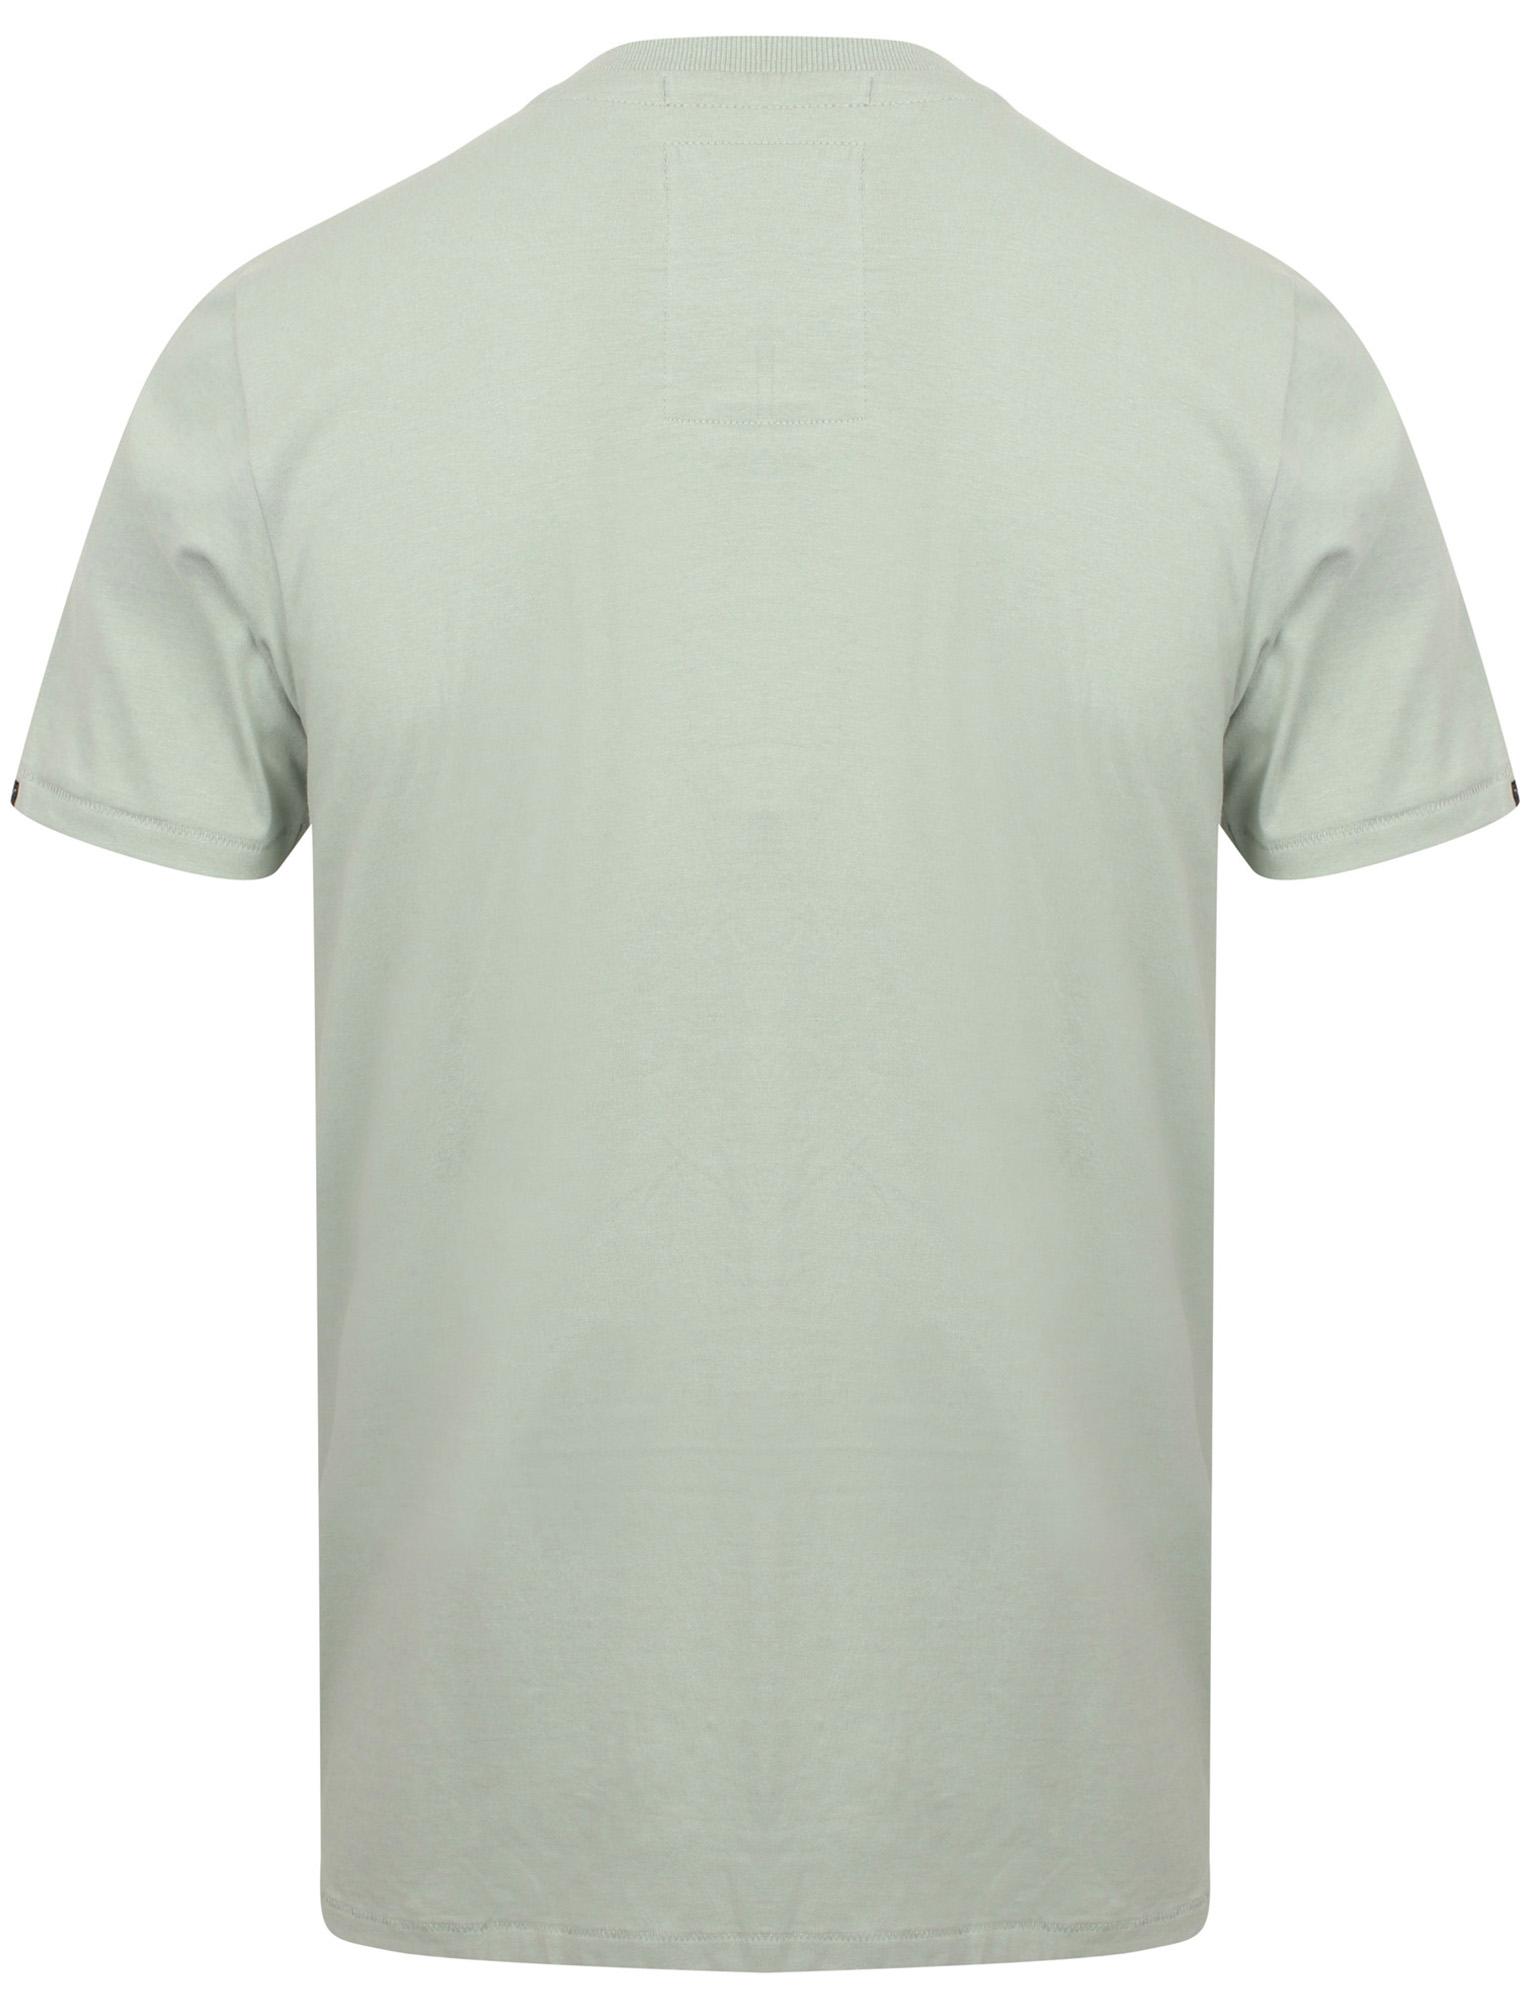 New-Mens-Tokyo-Laundry-Branded-Ellsworth-Crew-Neck-Cotton-Rich-T-shirt-Size-S-XL thumbnail 9